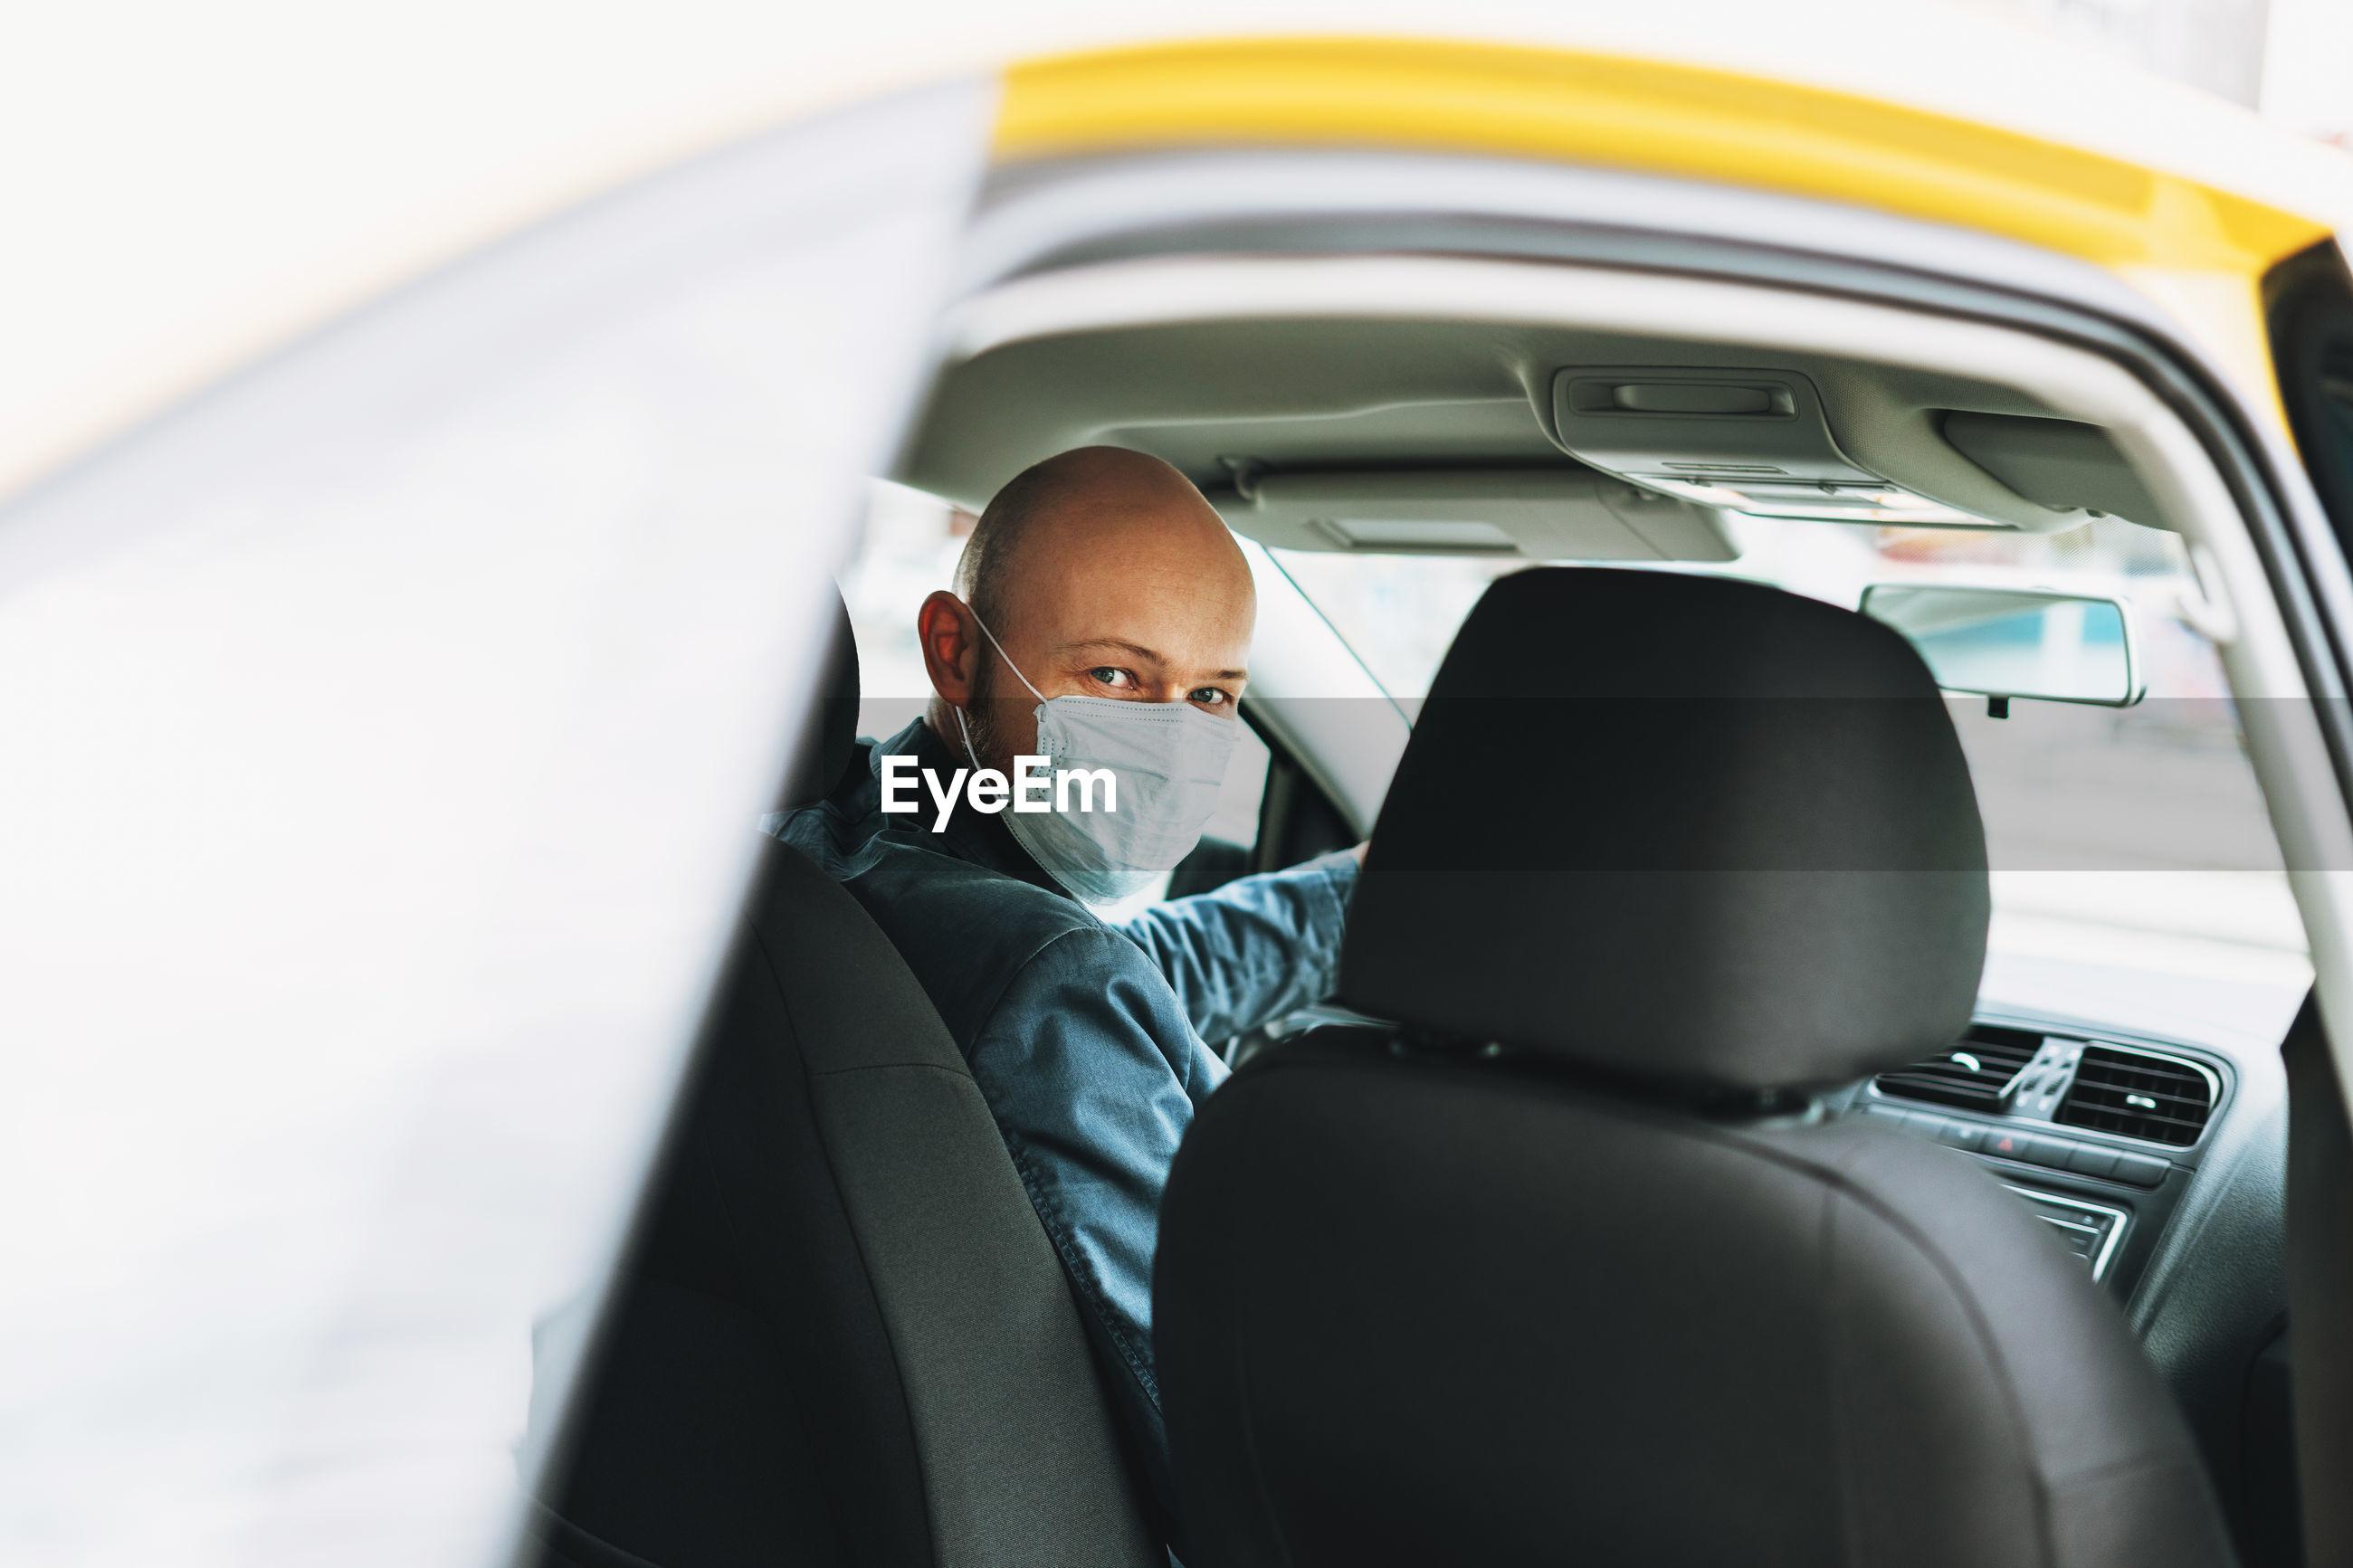 Portrait of man wearing mask sitting in car seen through window